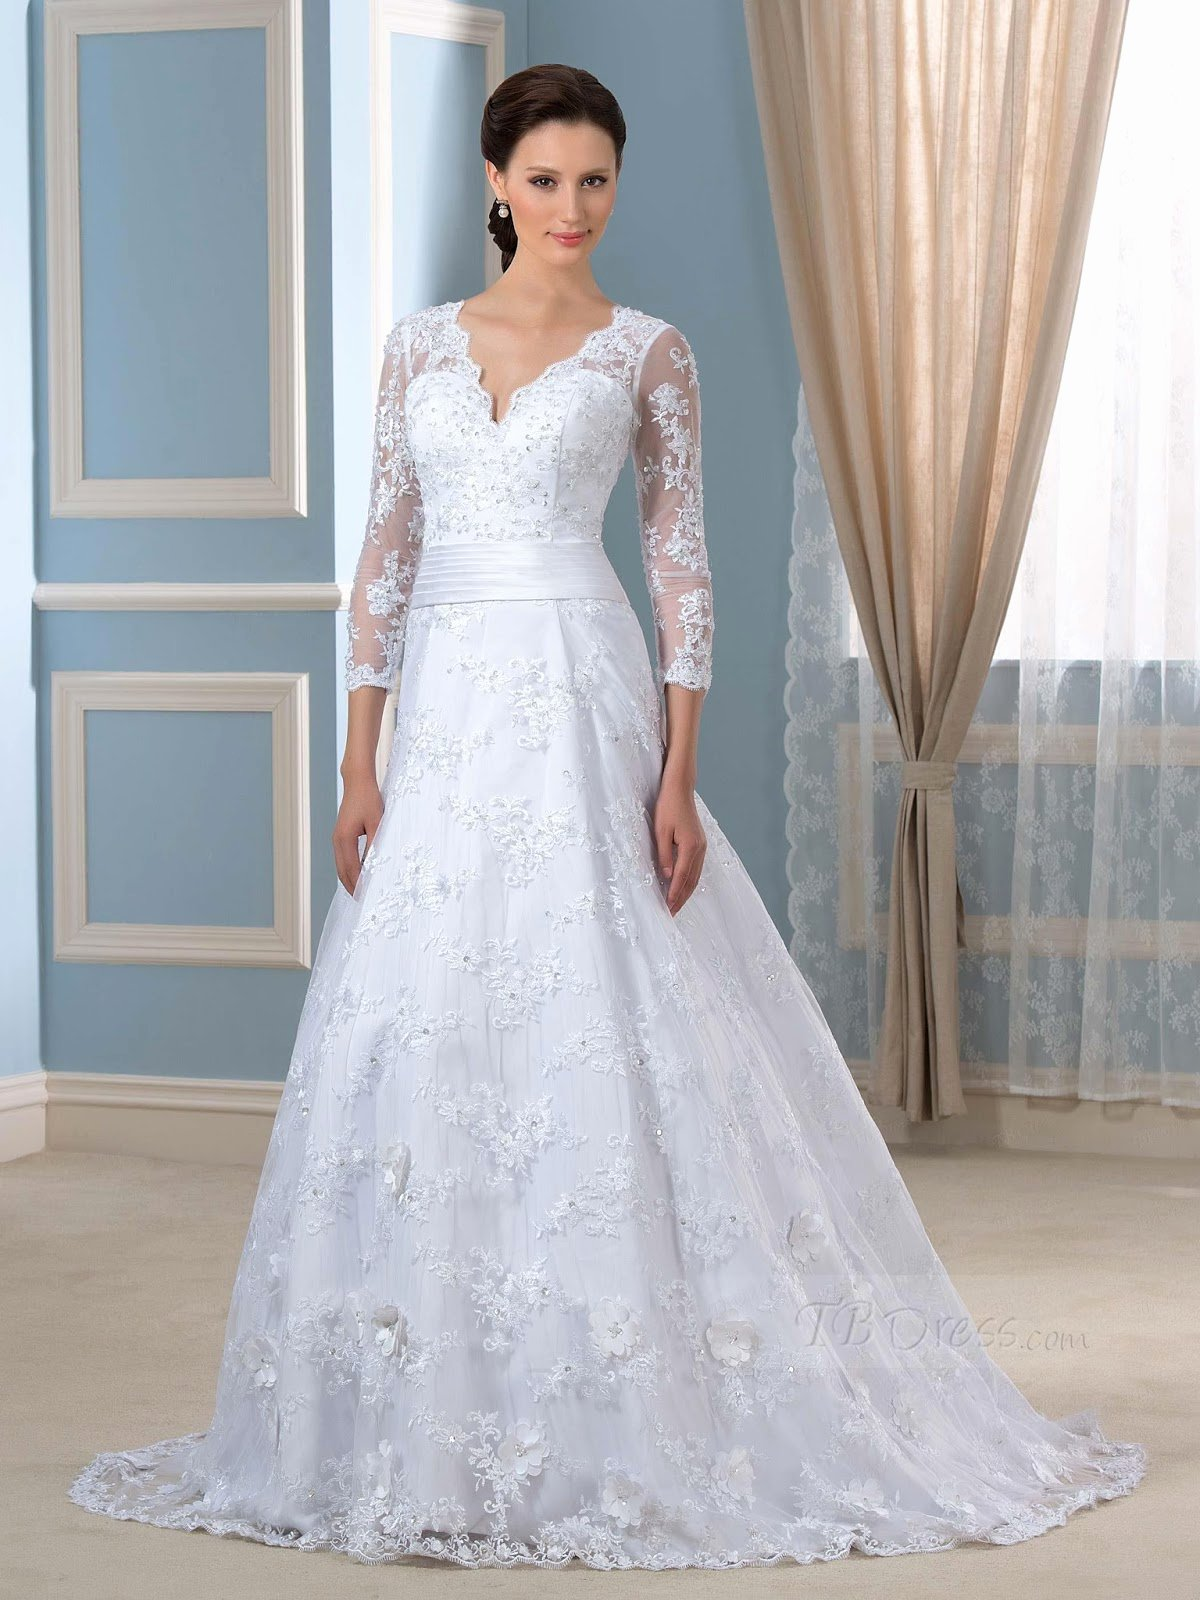 Simple Wedding Dress Patterns Inspirational Crochet Wedding Dress Patterns Free